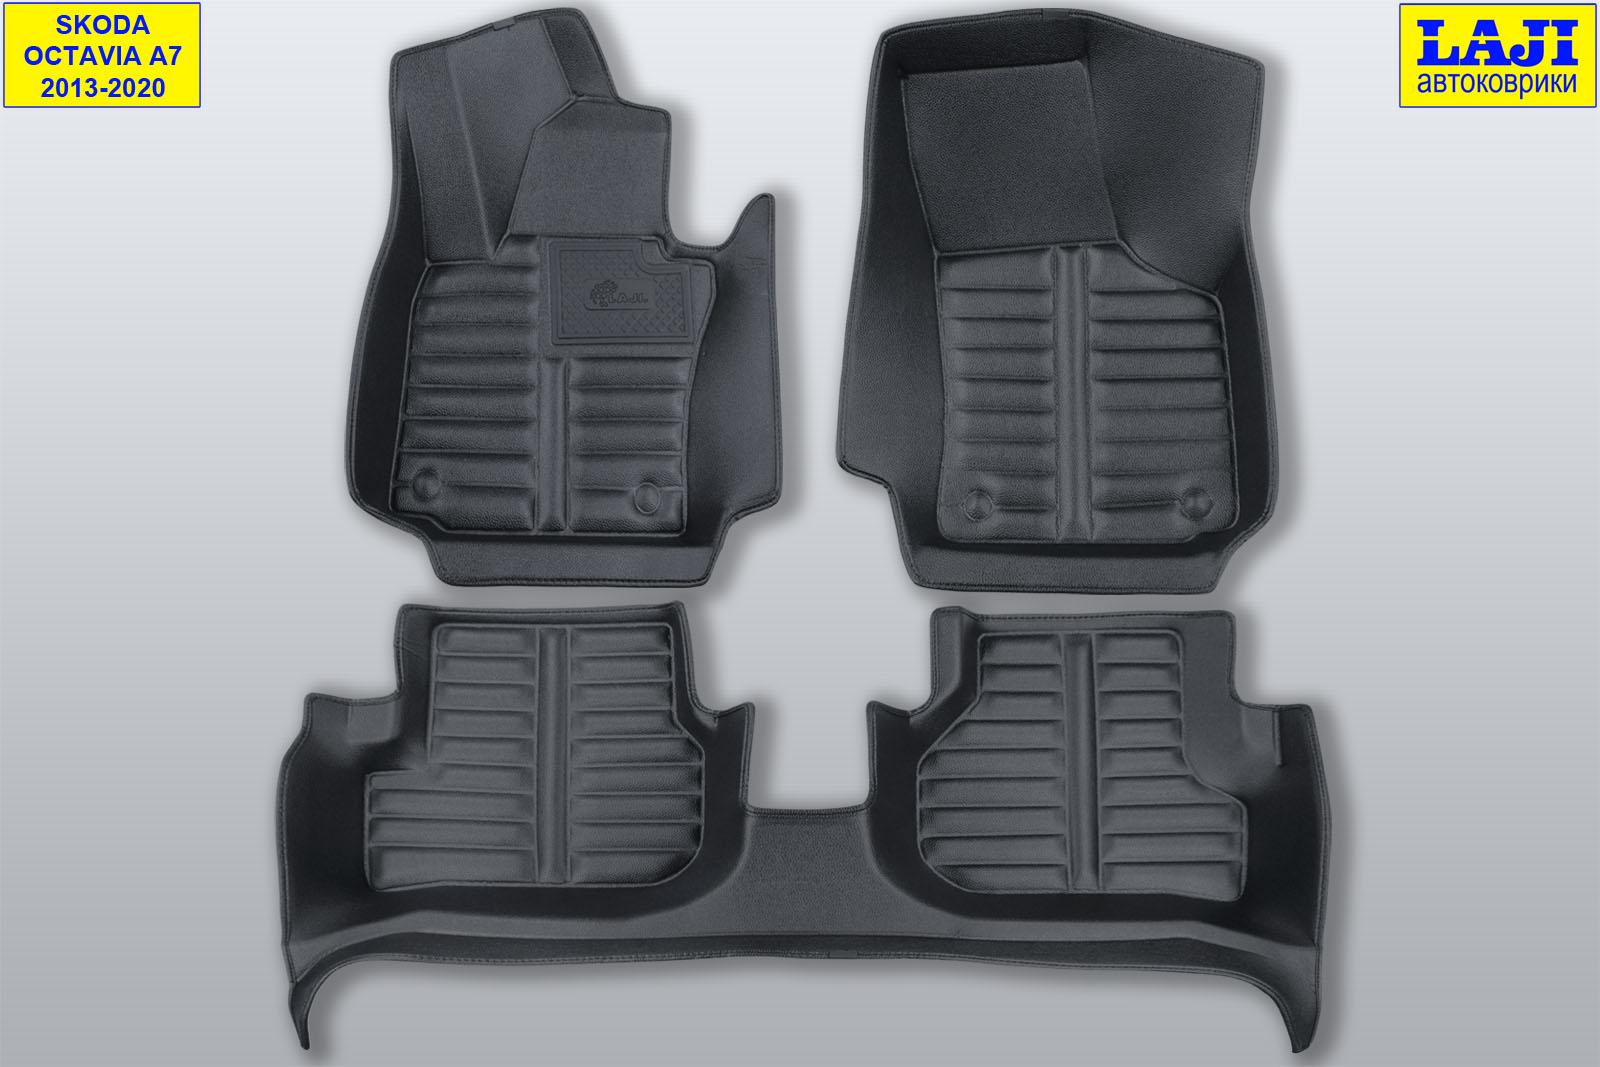 5D коврики в салон Skoda Octavia A7 2013-2020 1